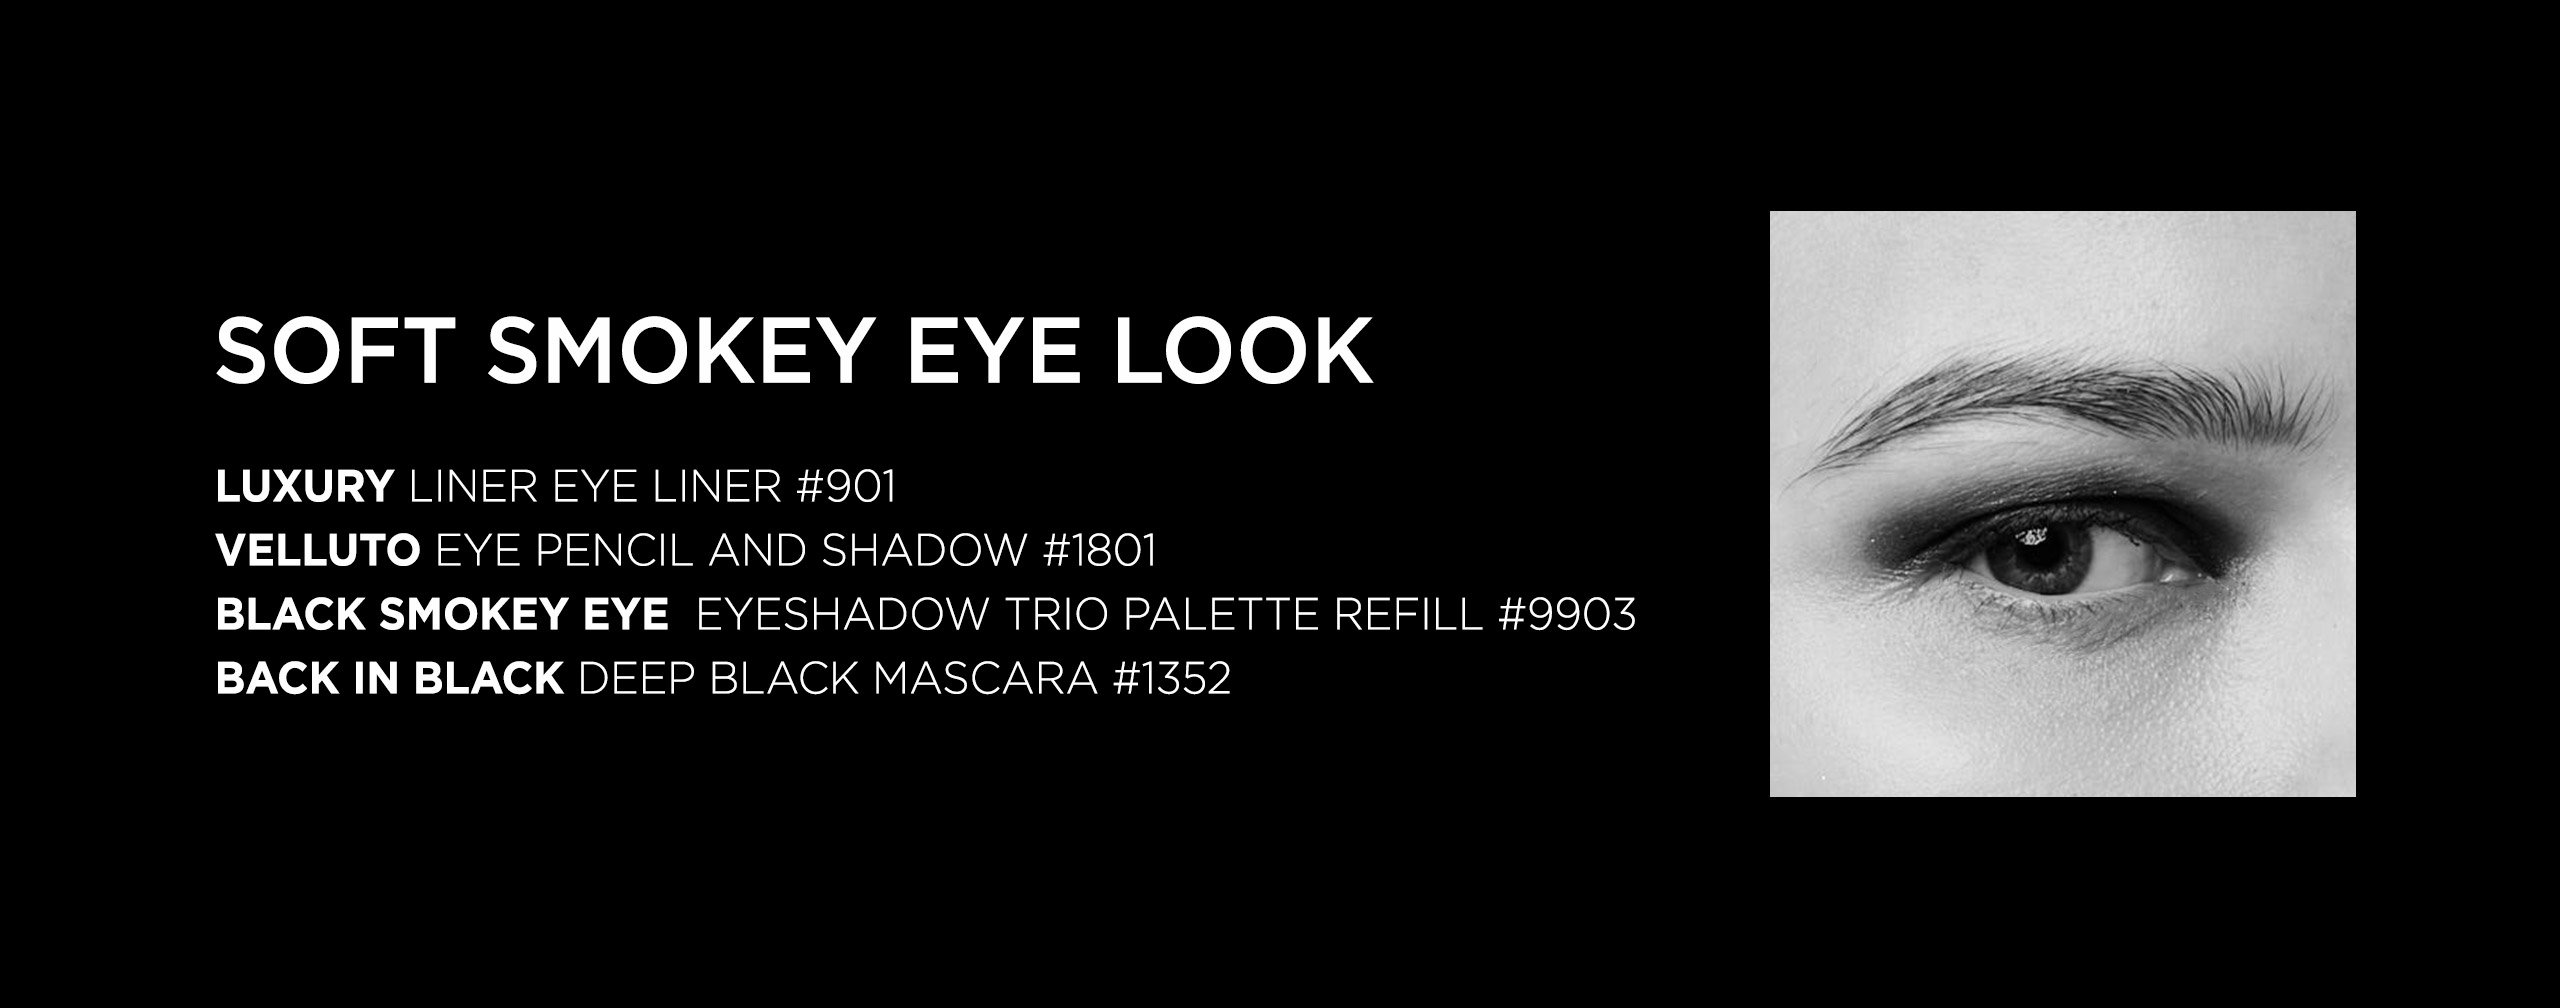 Soft Smokey Eye Look